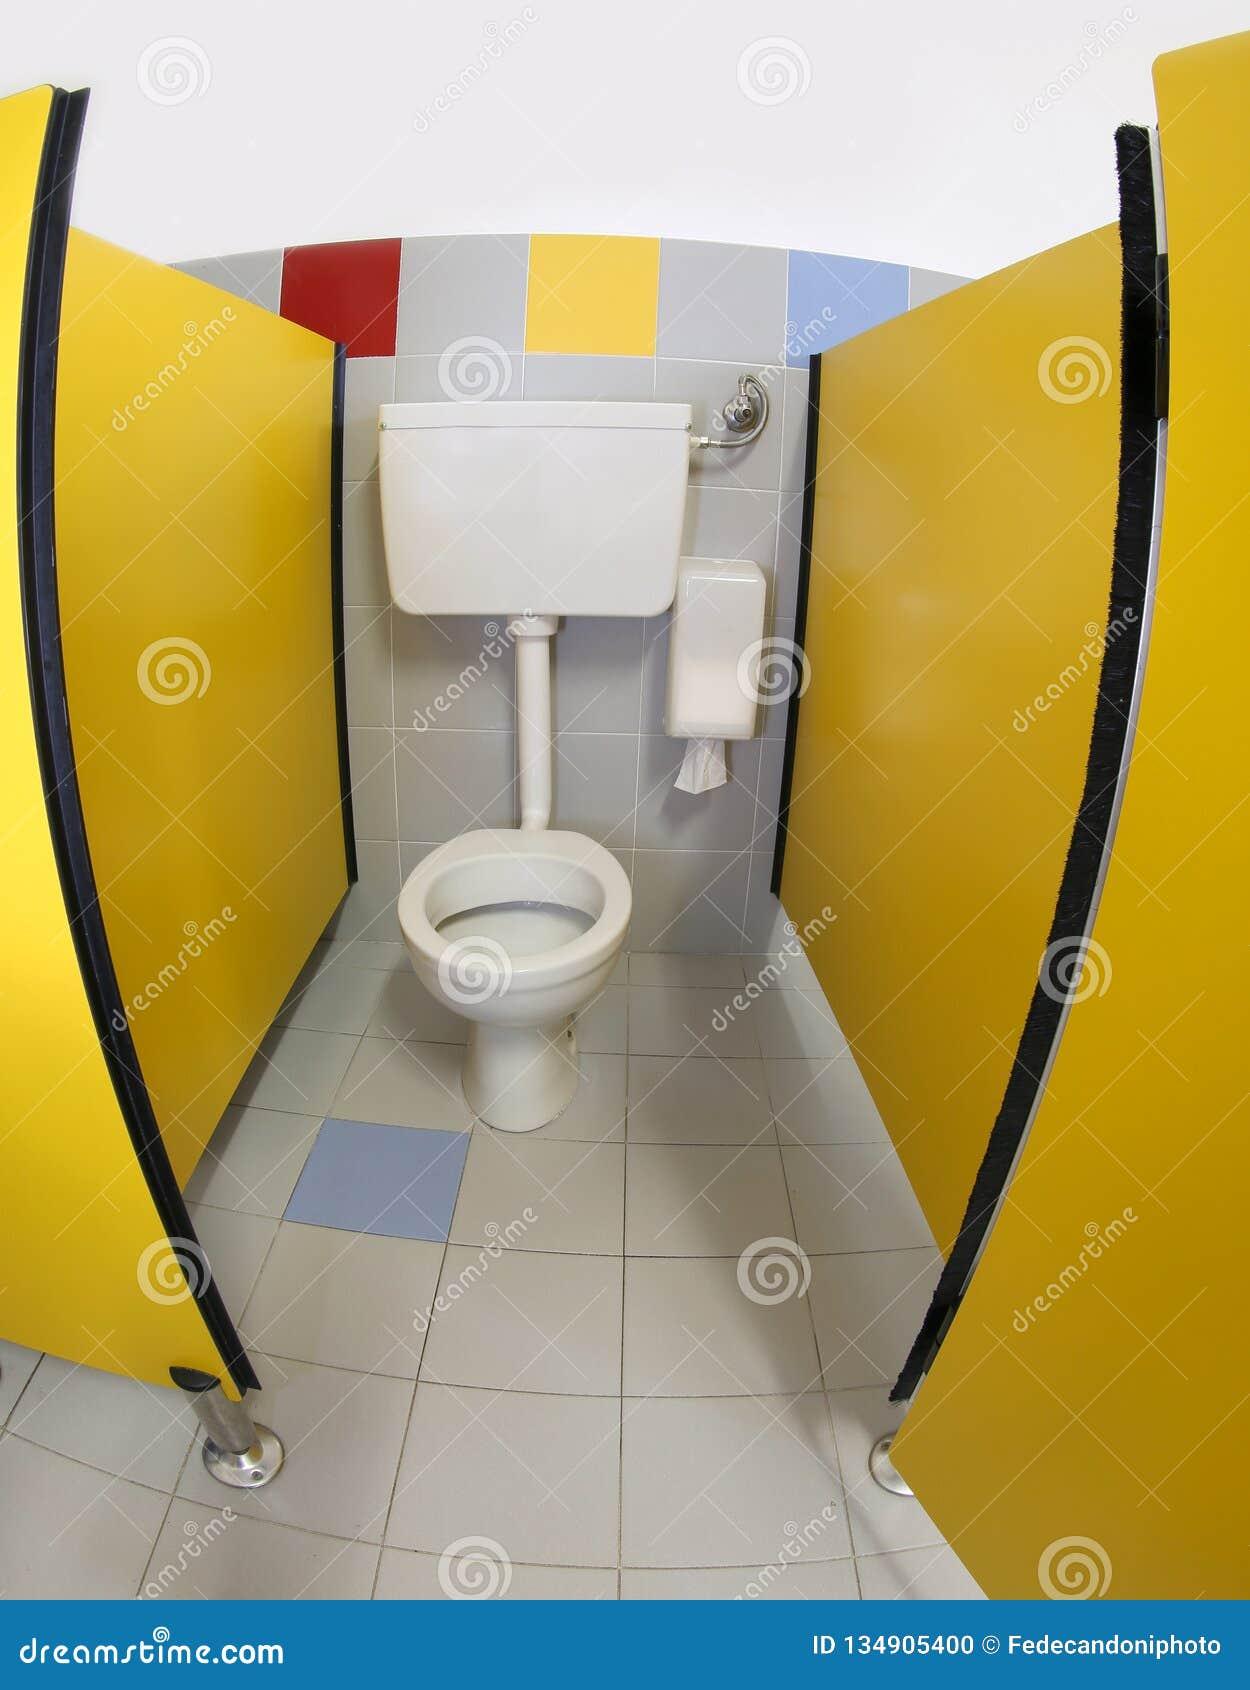 Toilet inside the nursery bathrooms